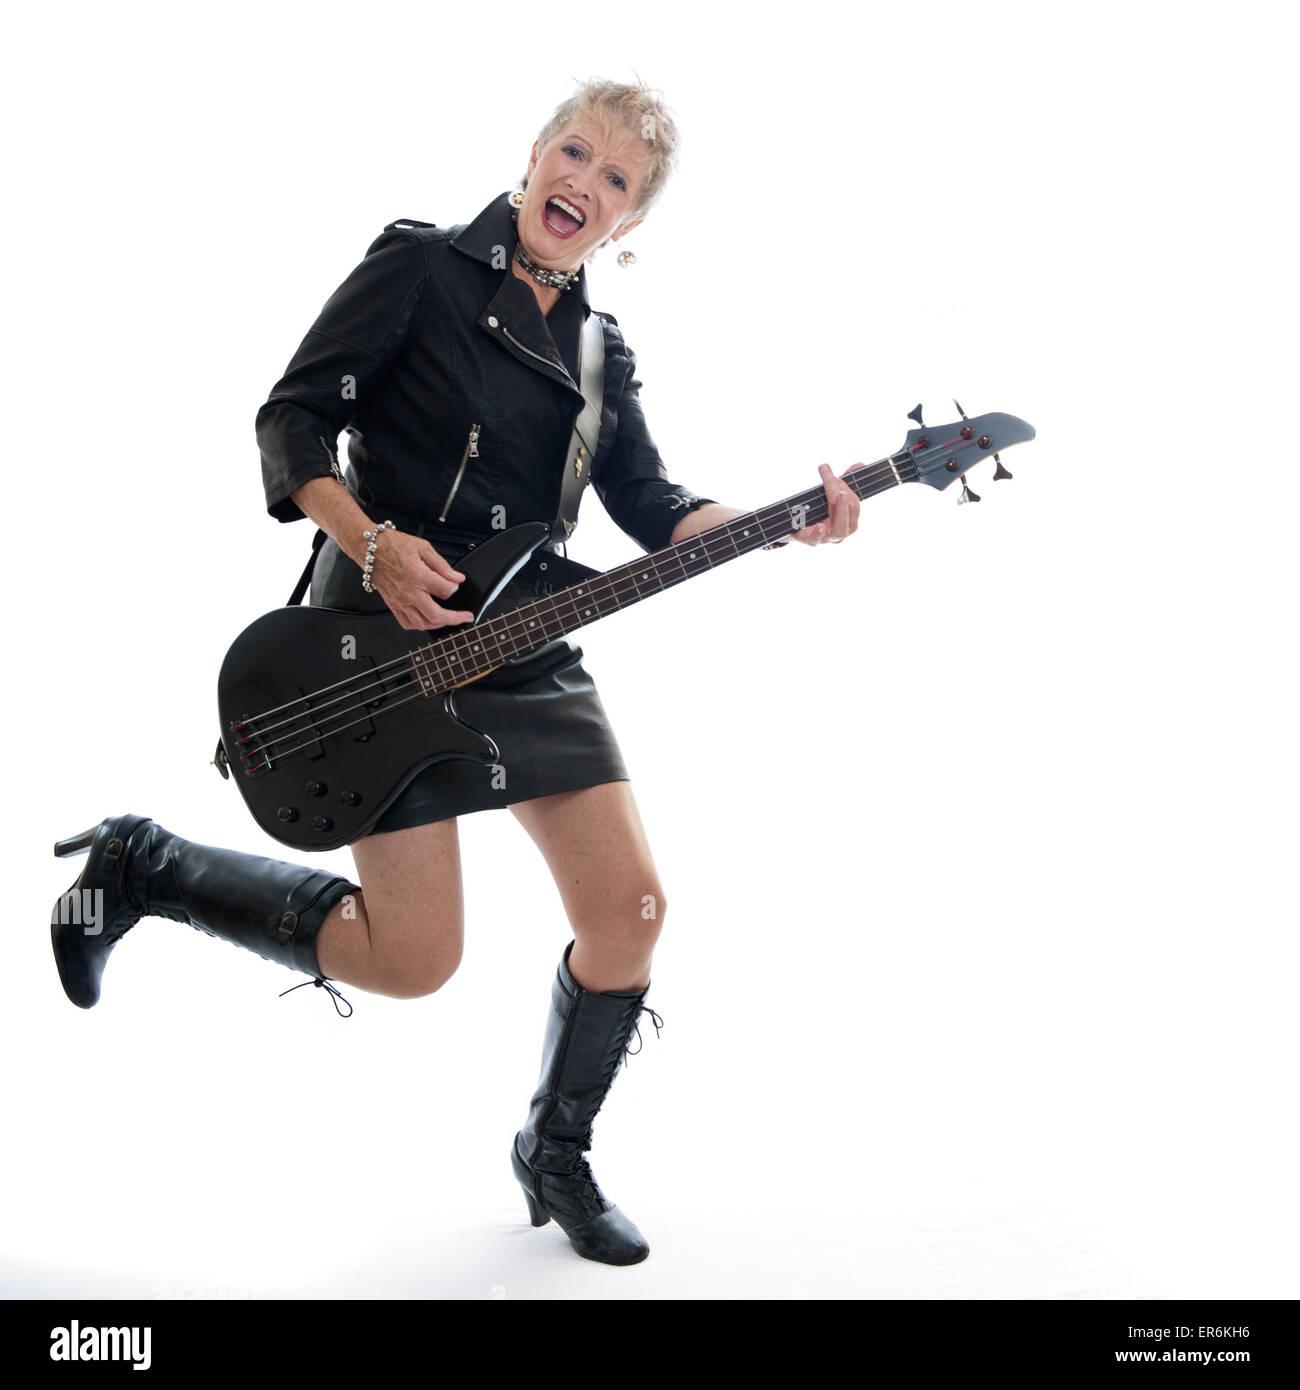 NICERS! wanna Granny rock